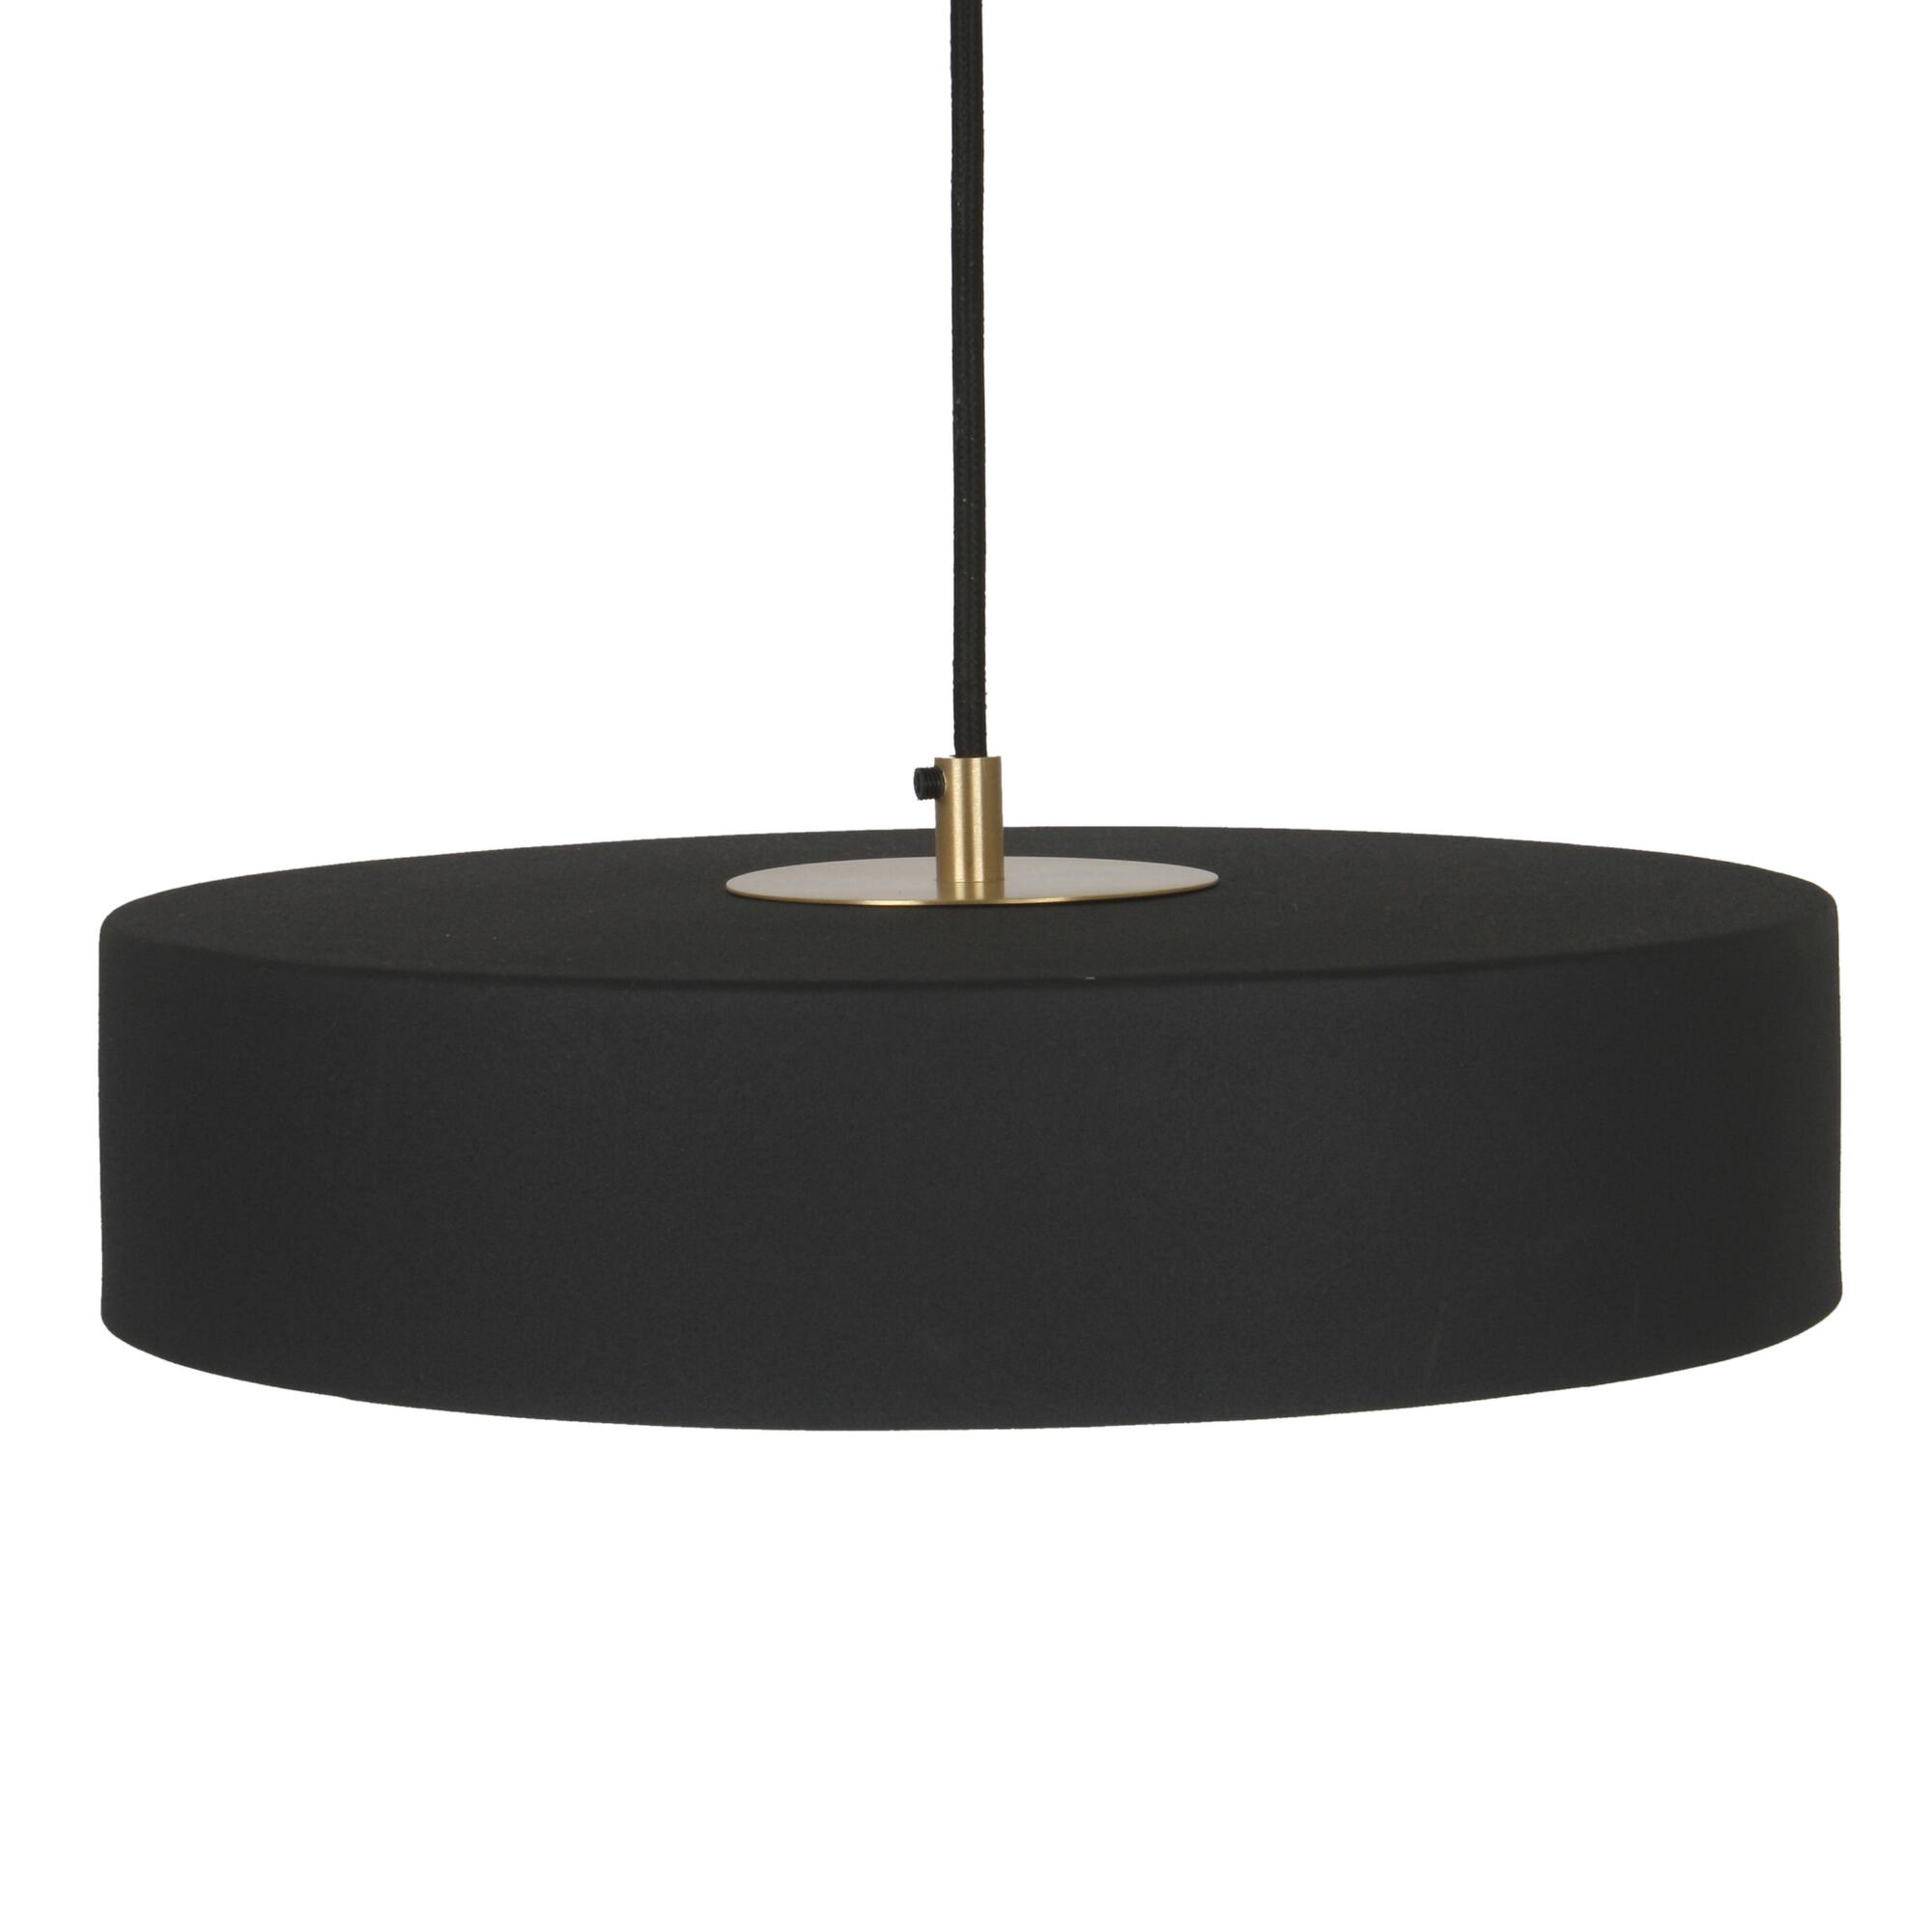 Black Iron And Brass Circle Kingsley Pendant Lamp $229.99